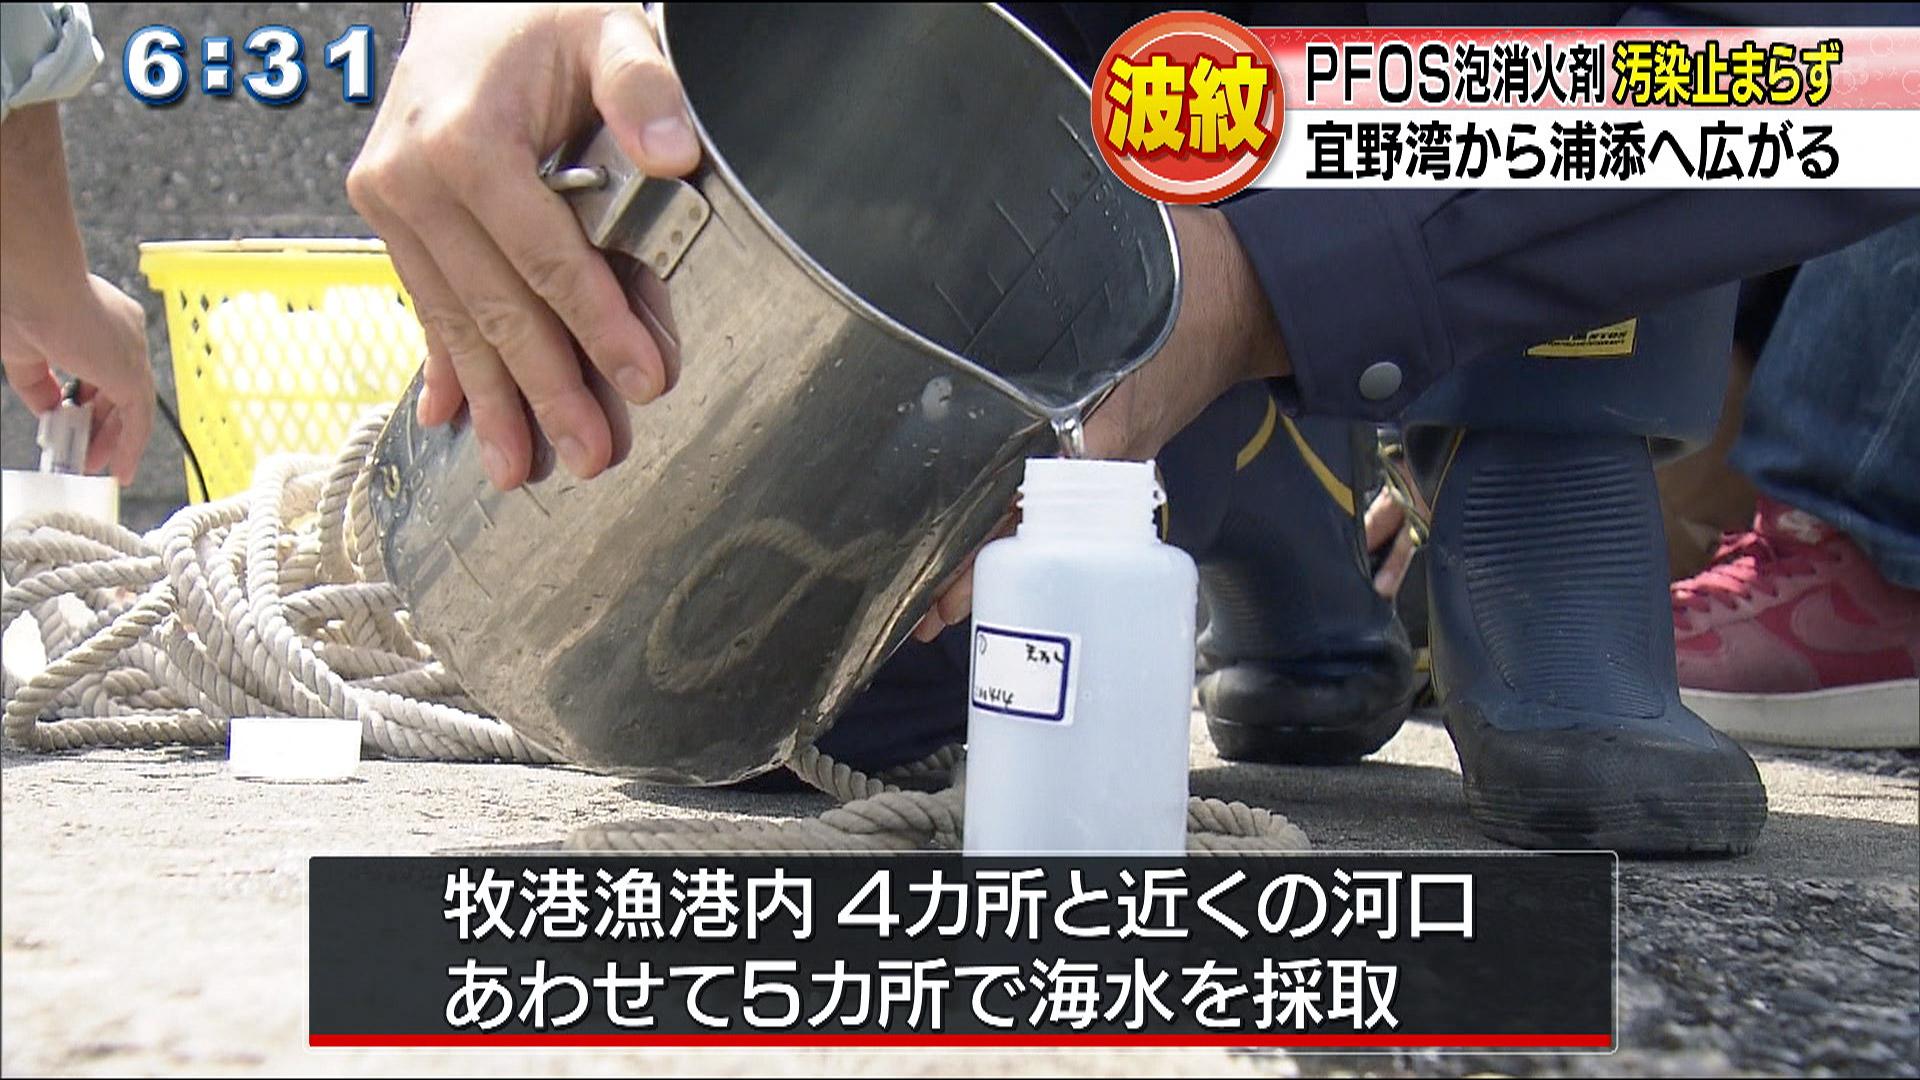 PFOS含む泡消火剤の汚染状況を確認